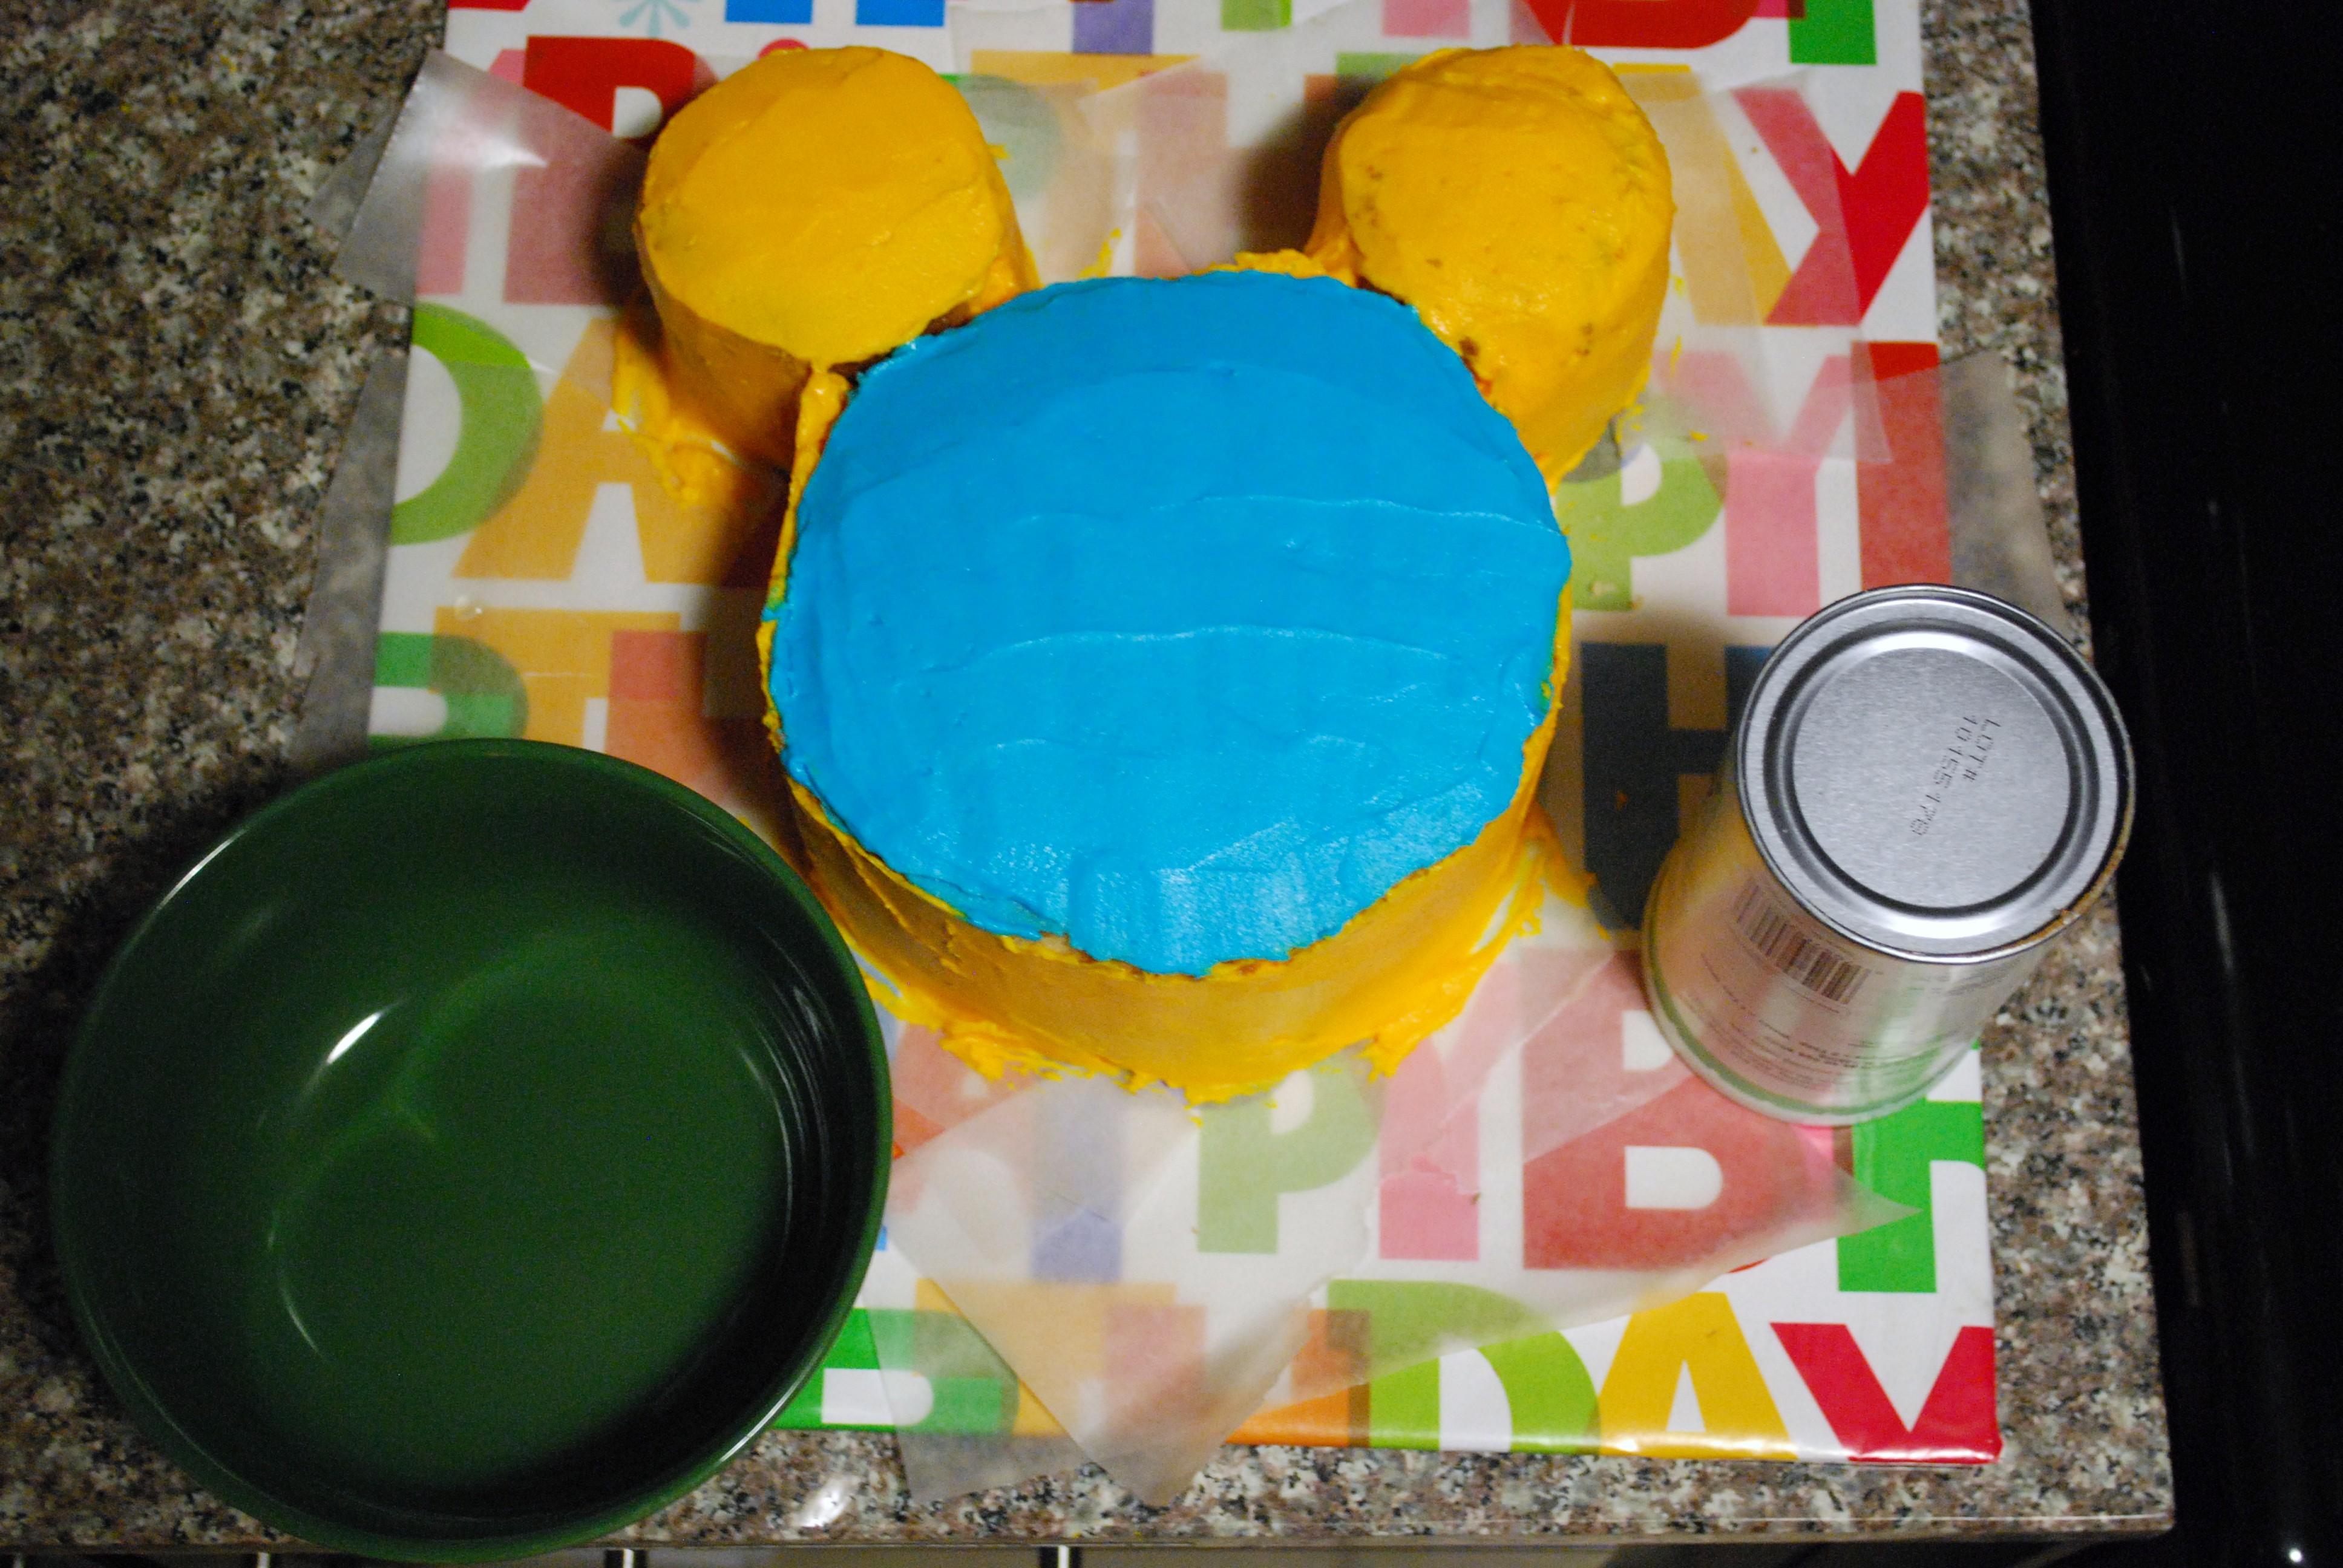 Astonishing Toodles Cake Tutorial Make Myself At Home Funny Birthday Cards Online Alyptdamsfinfo